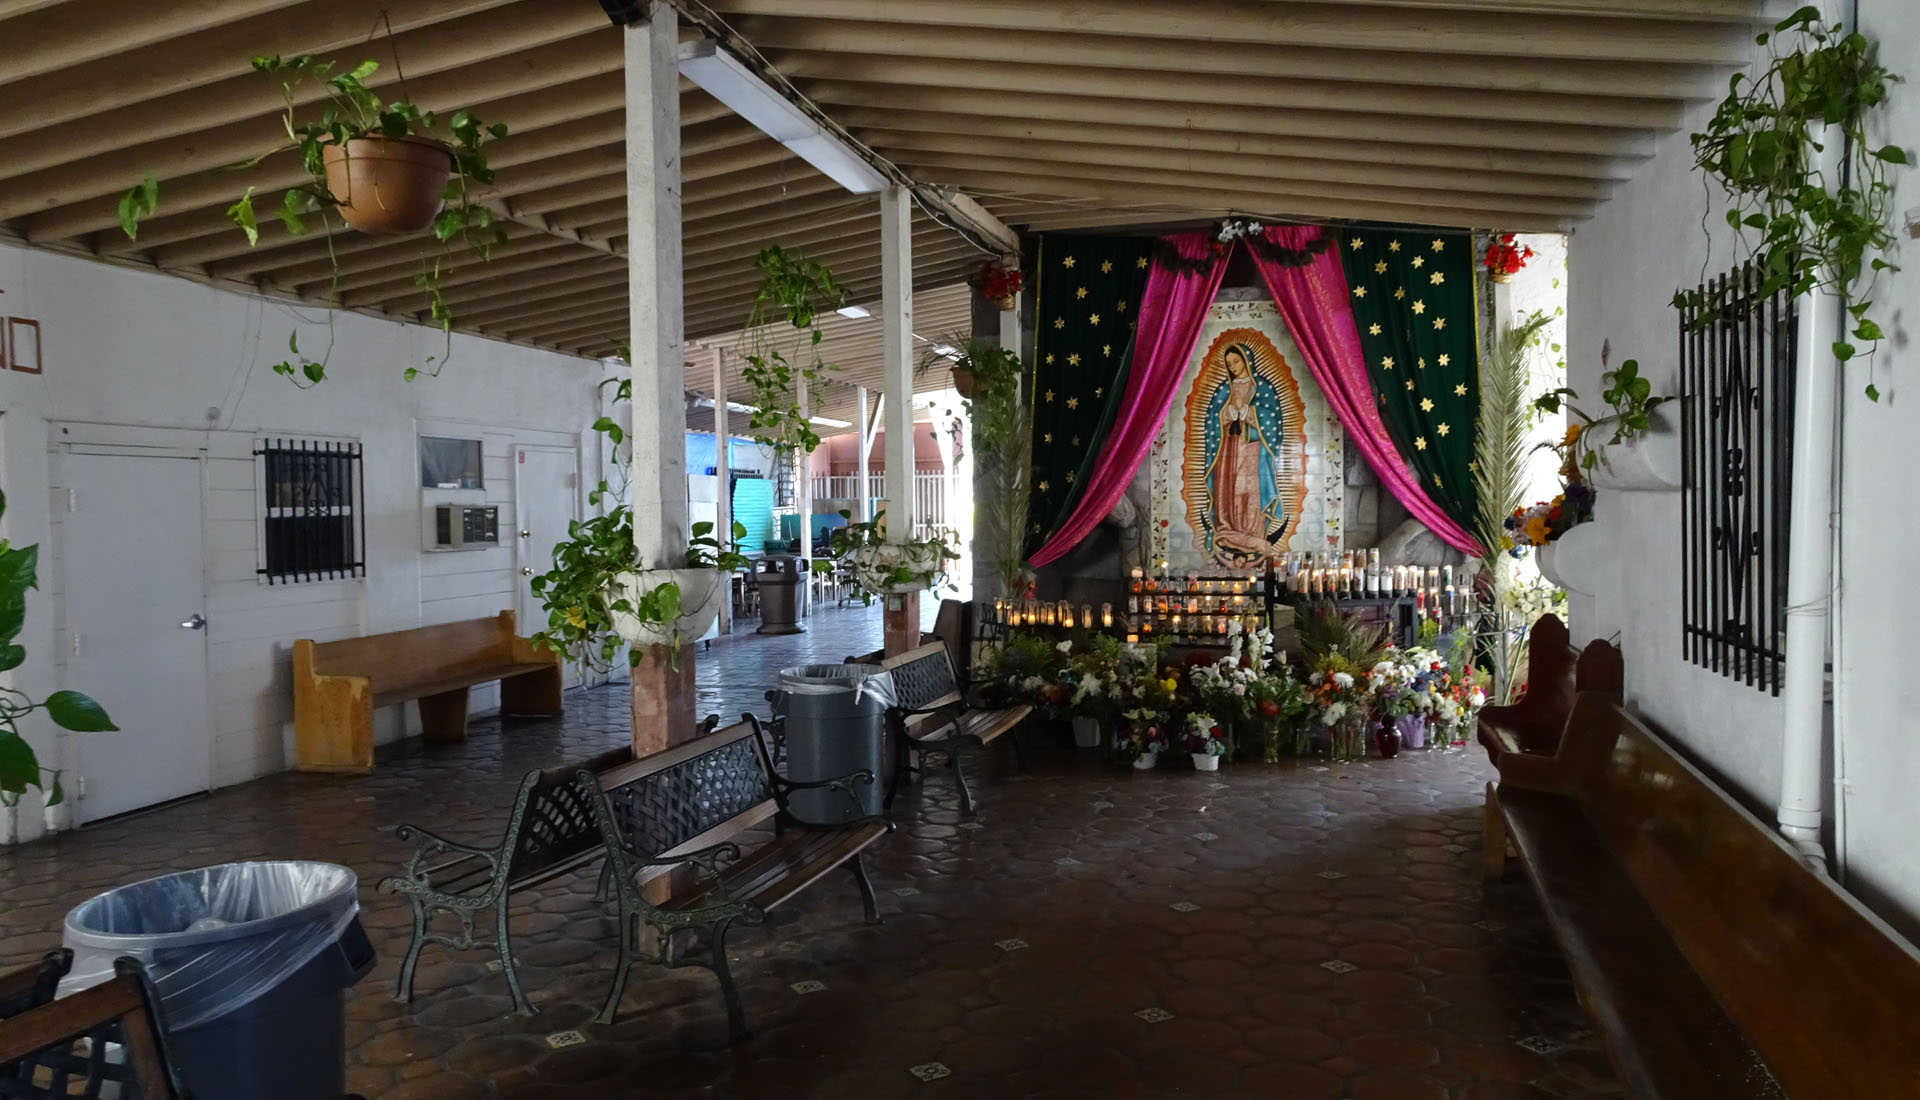 Presentation of St Mary Catholic Church